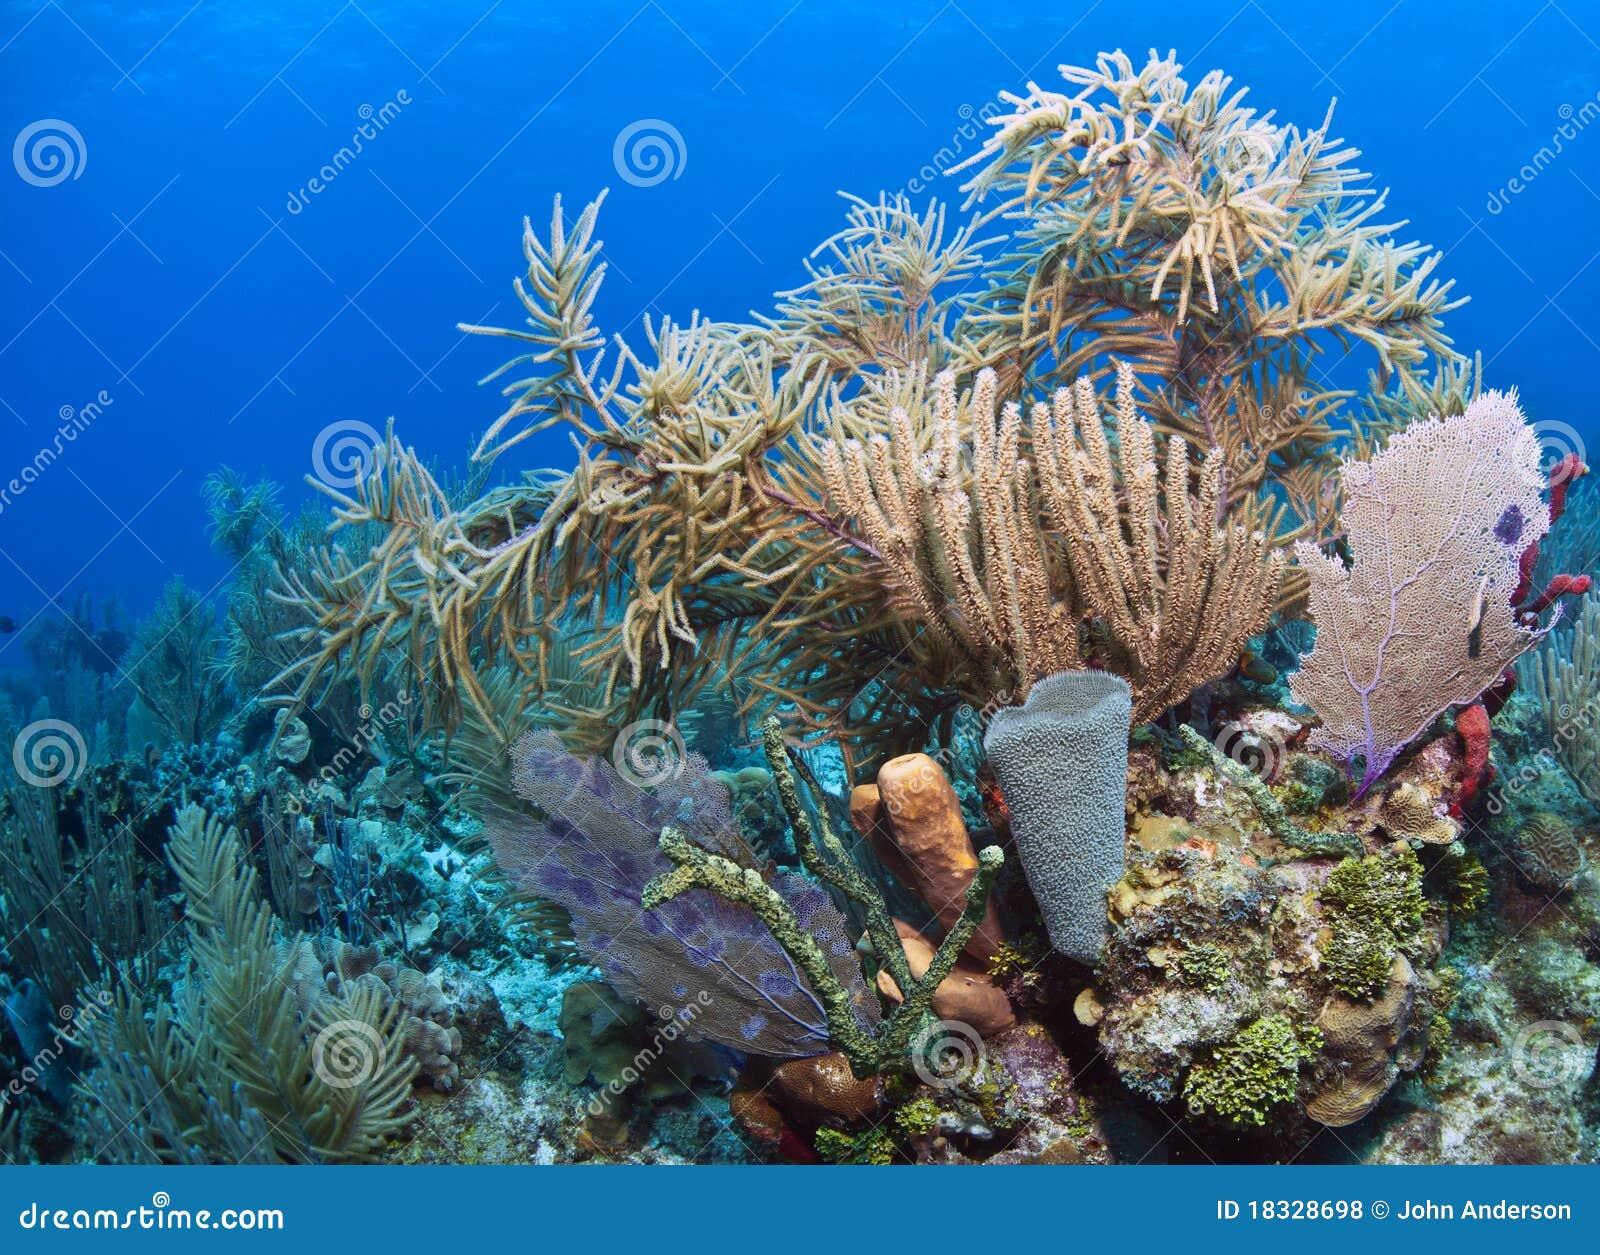 Coral Gardens Royalty Free Stock Photos Image 18328698